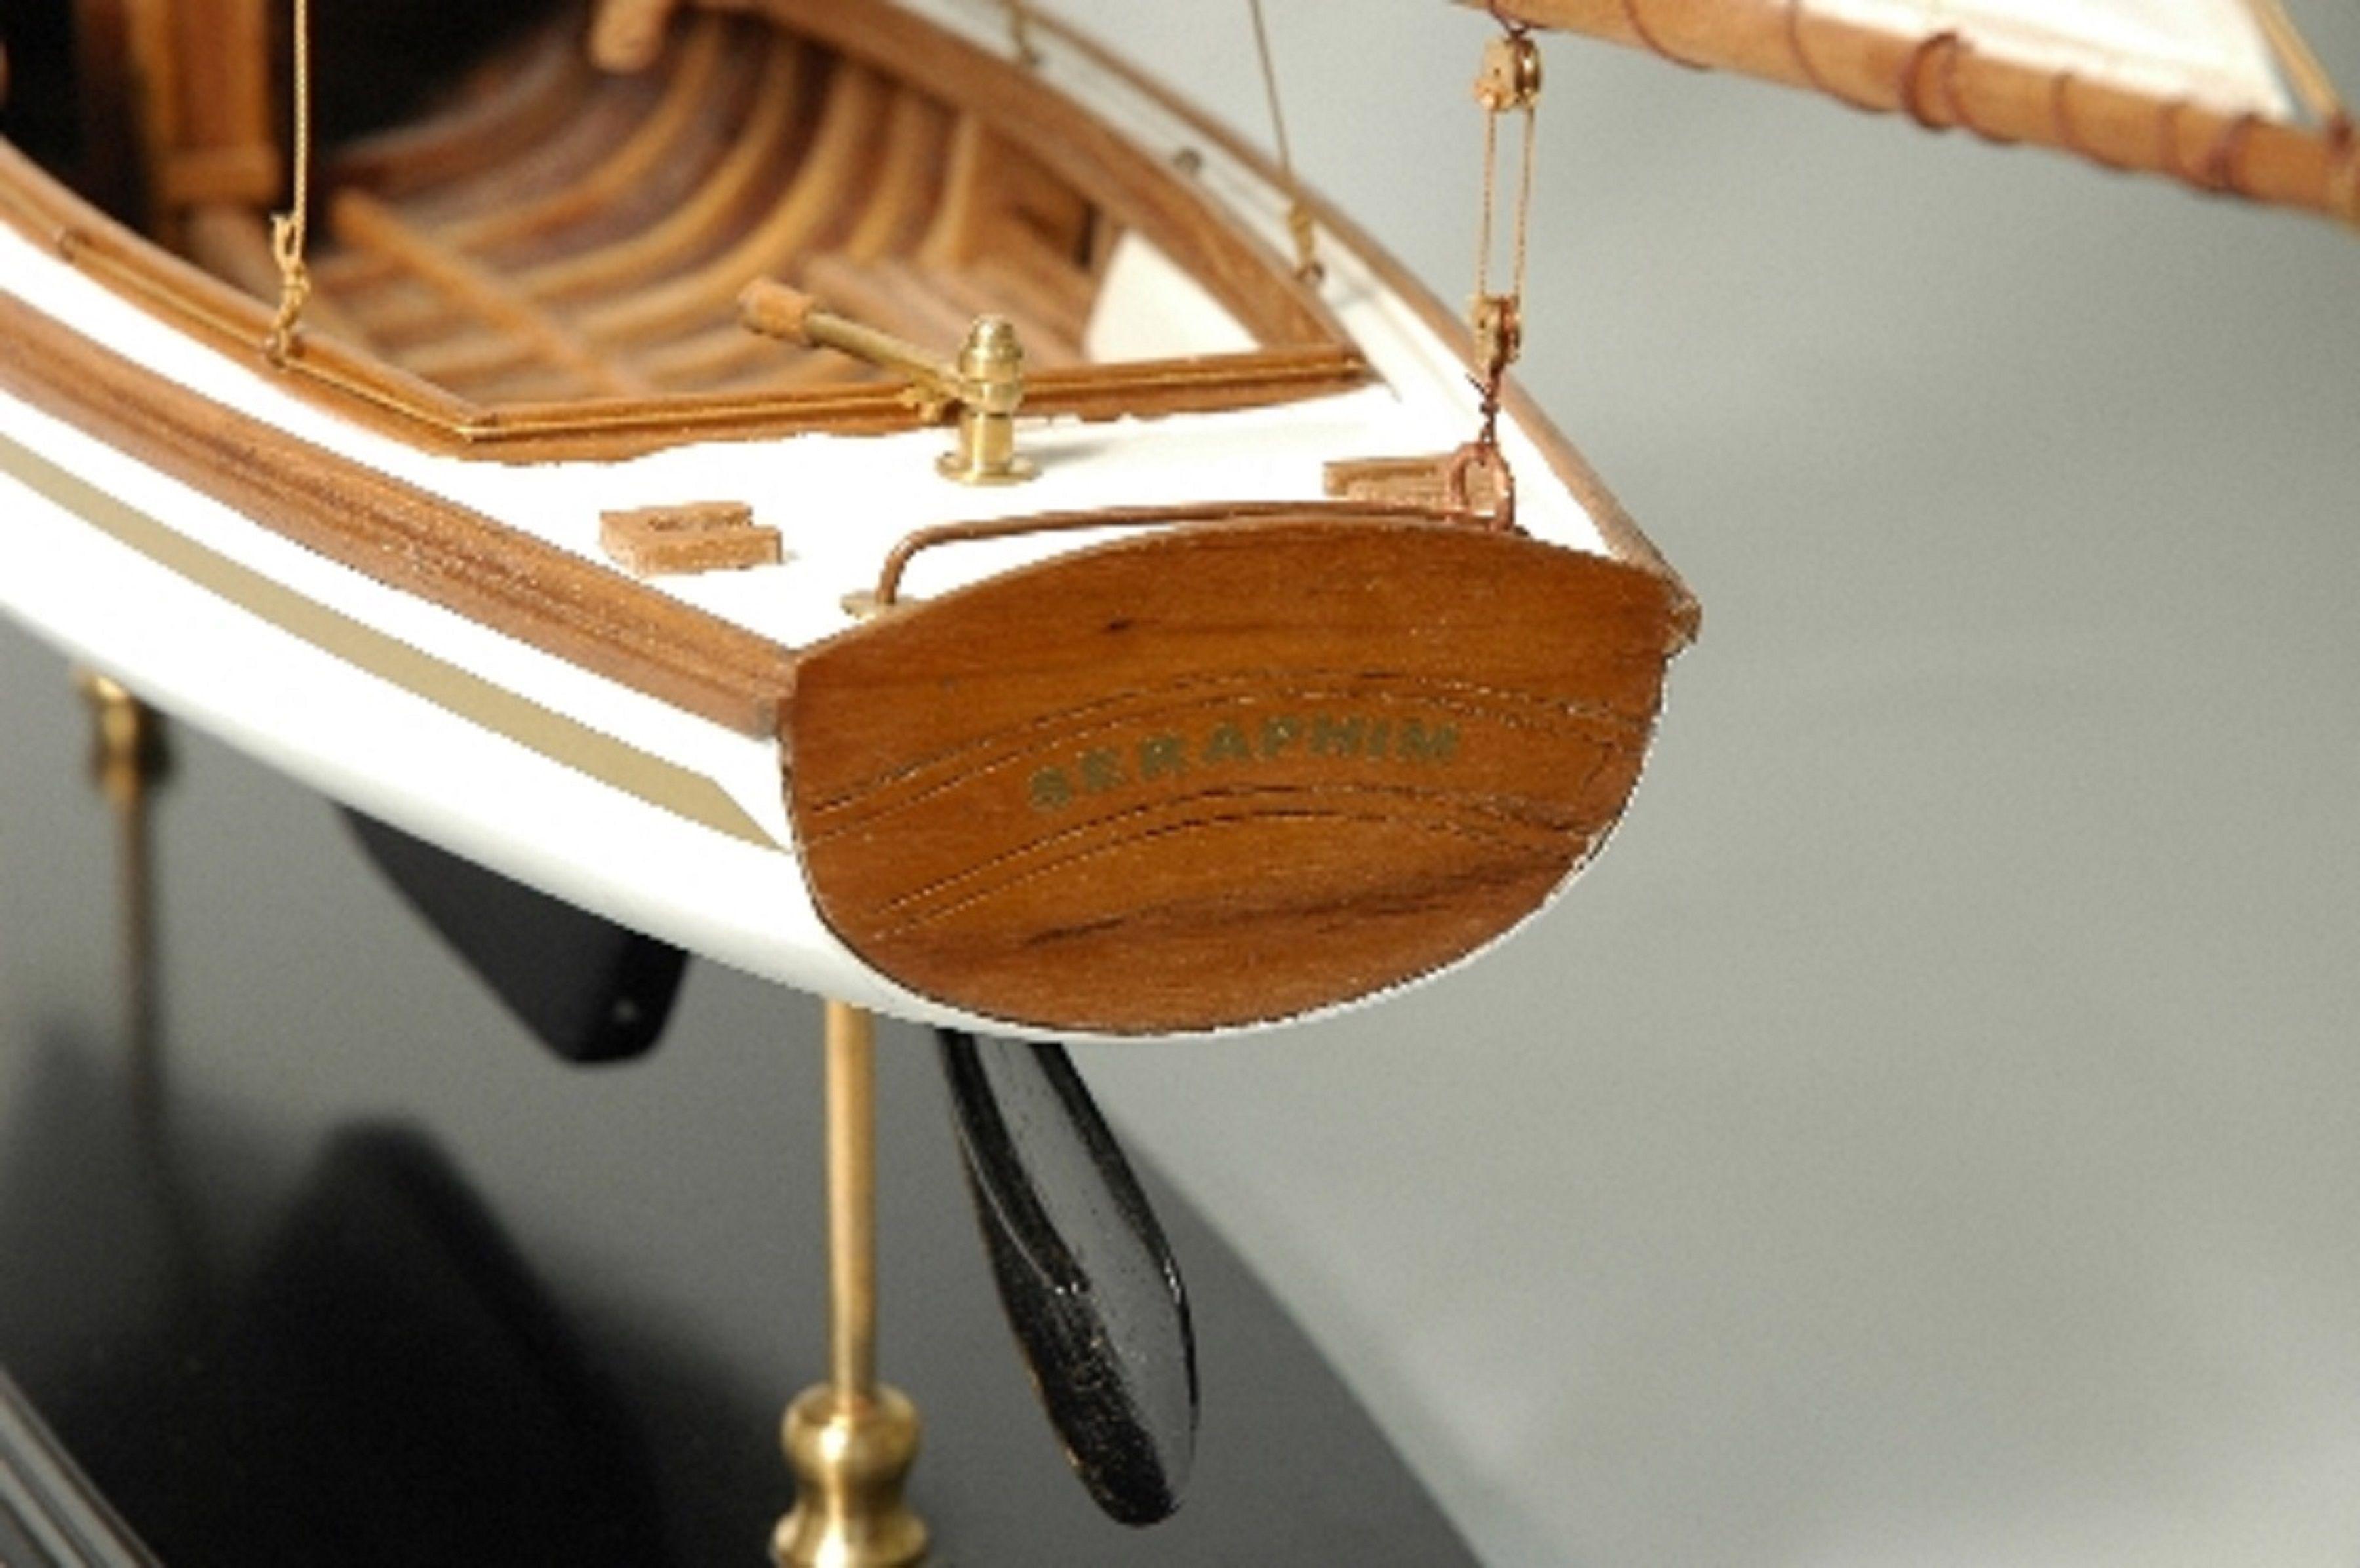 166-8439-Yare-Bure-Model-Yacht-Superior-Range